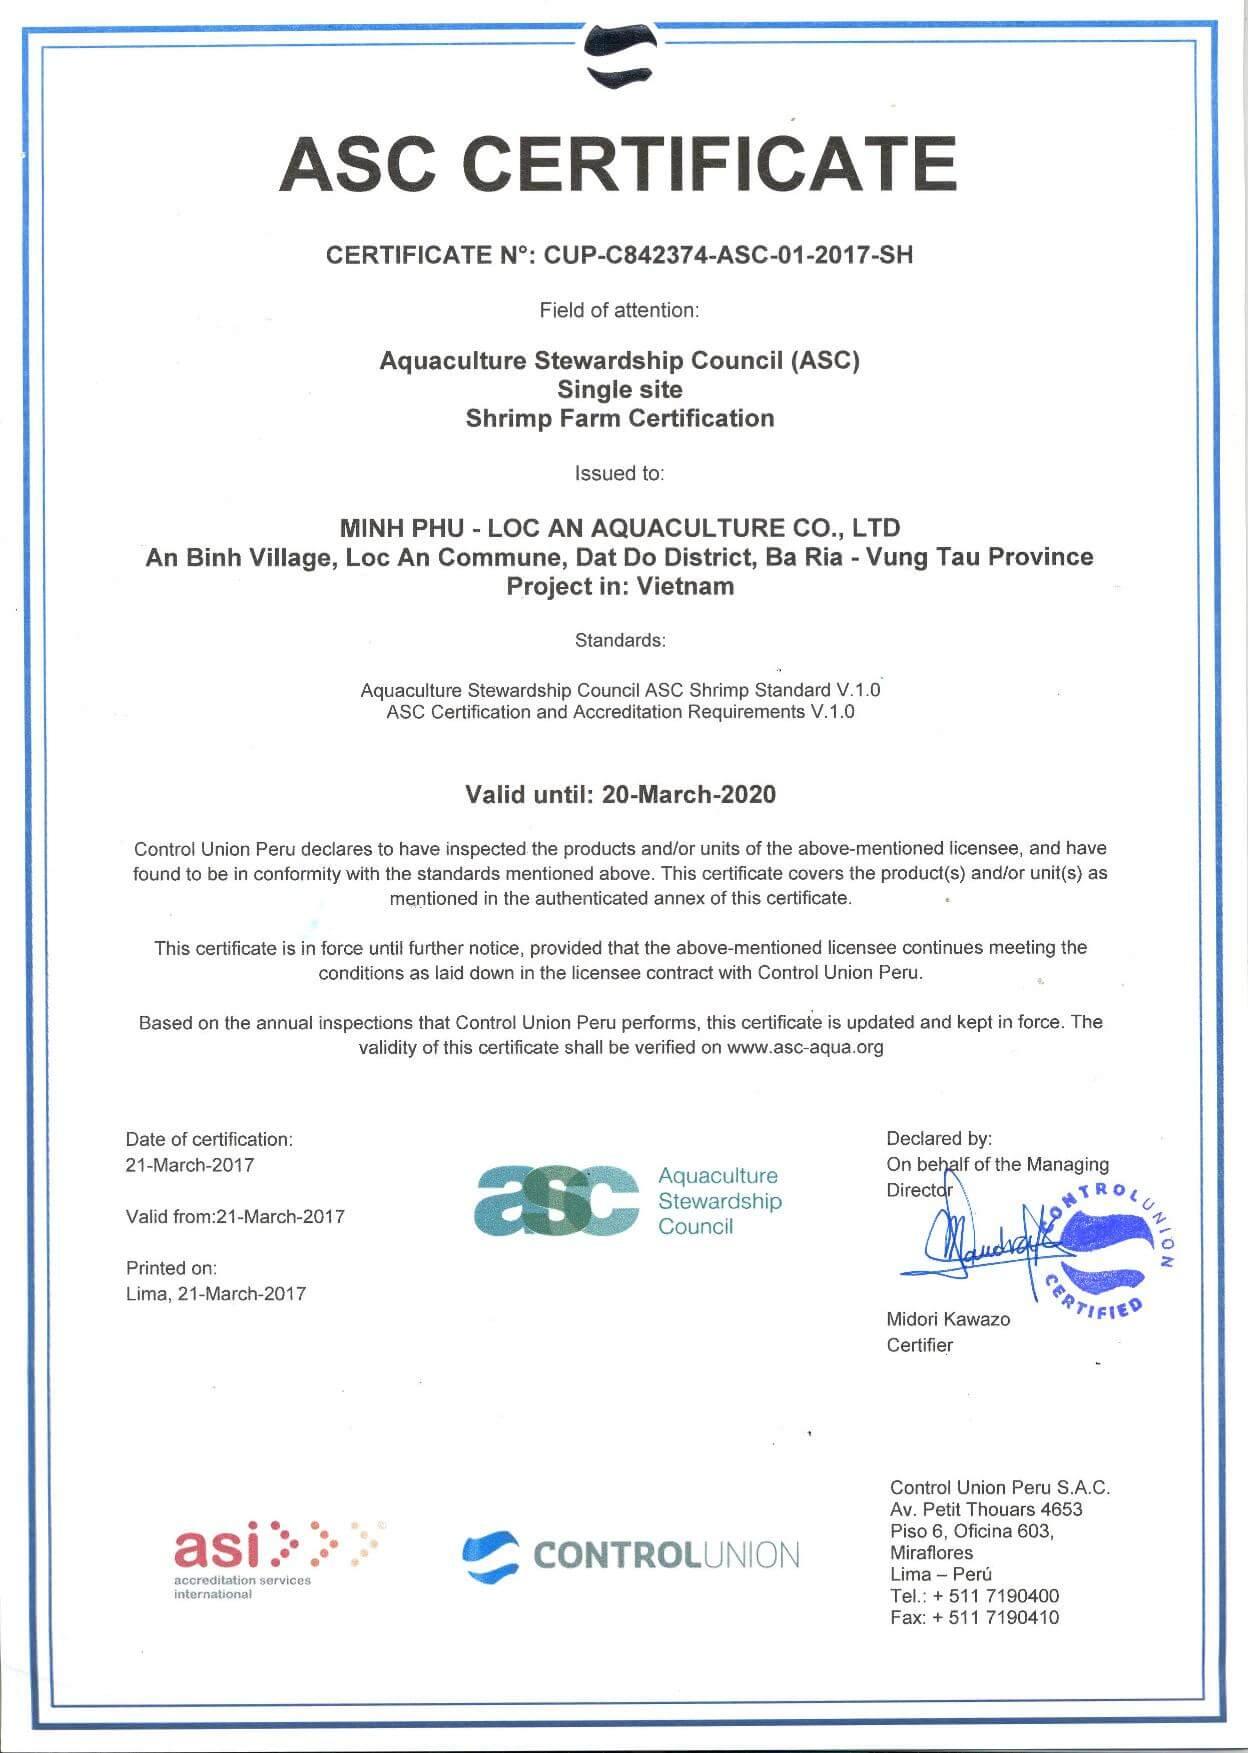 ASC CERTIFICATE MPLA